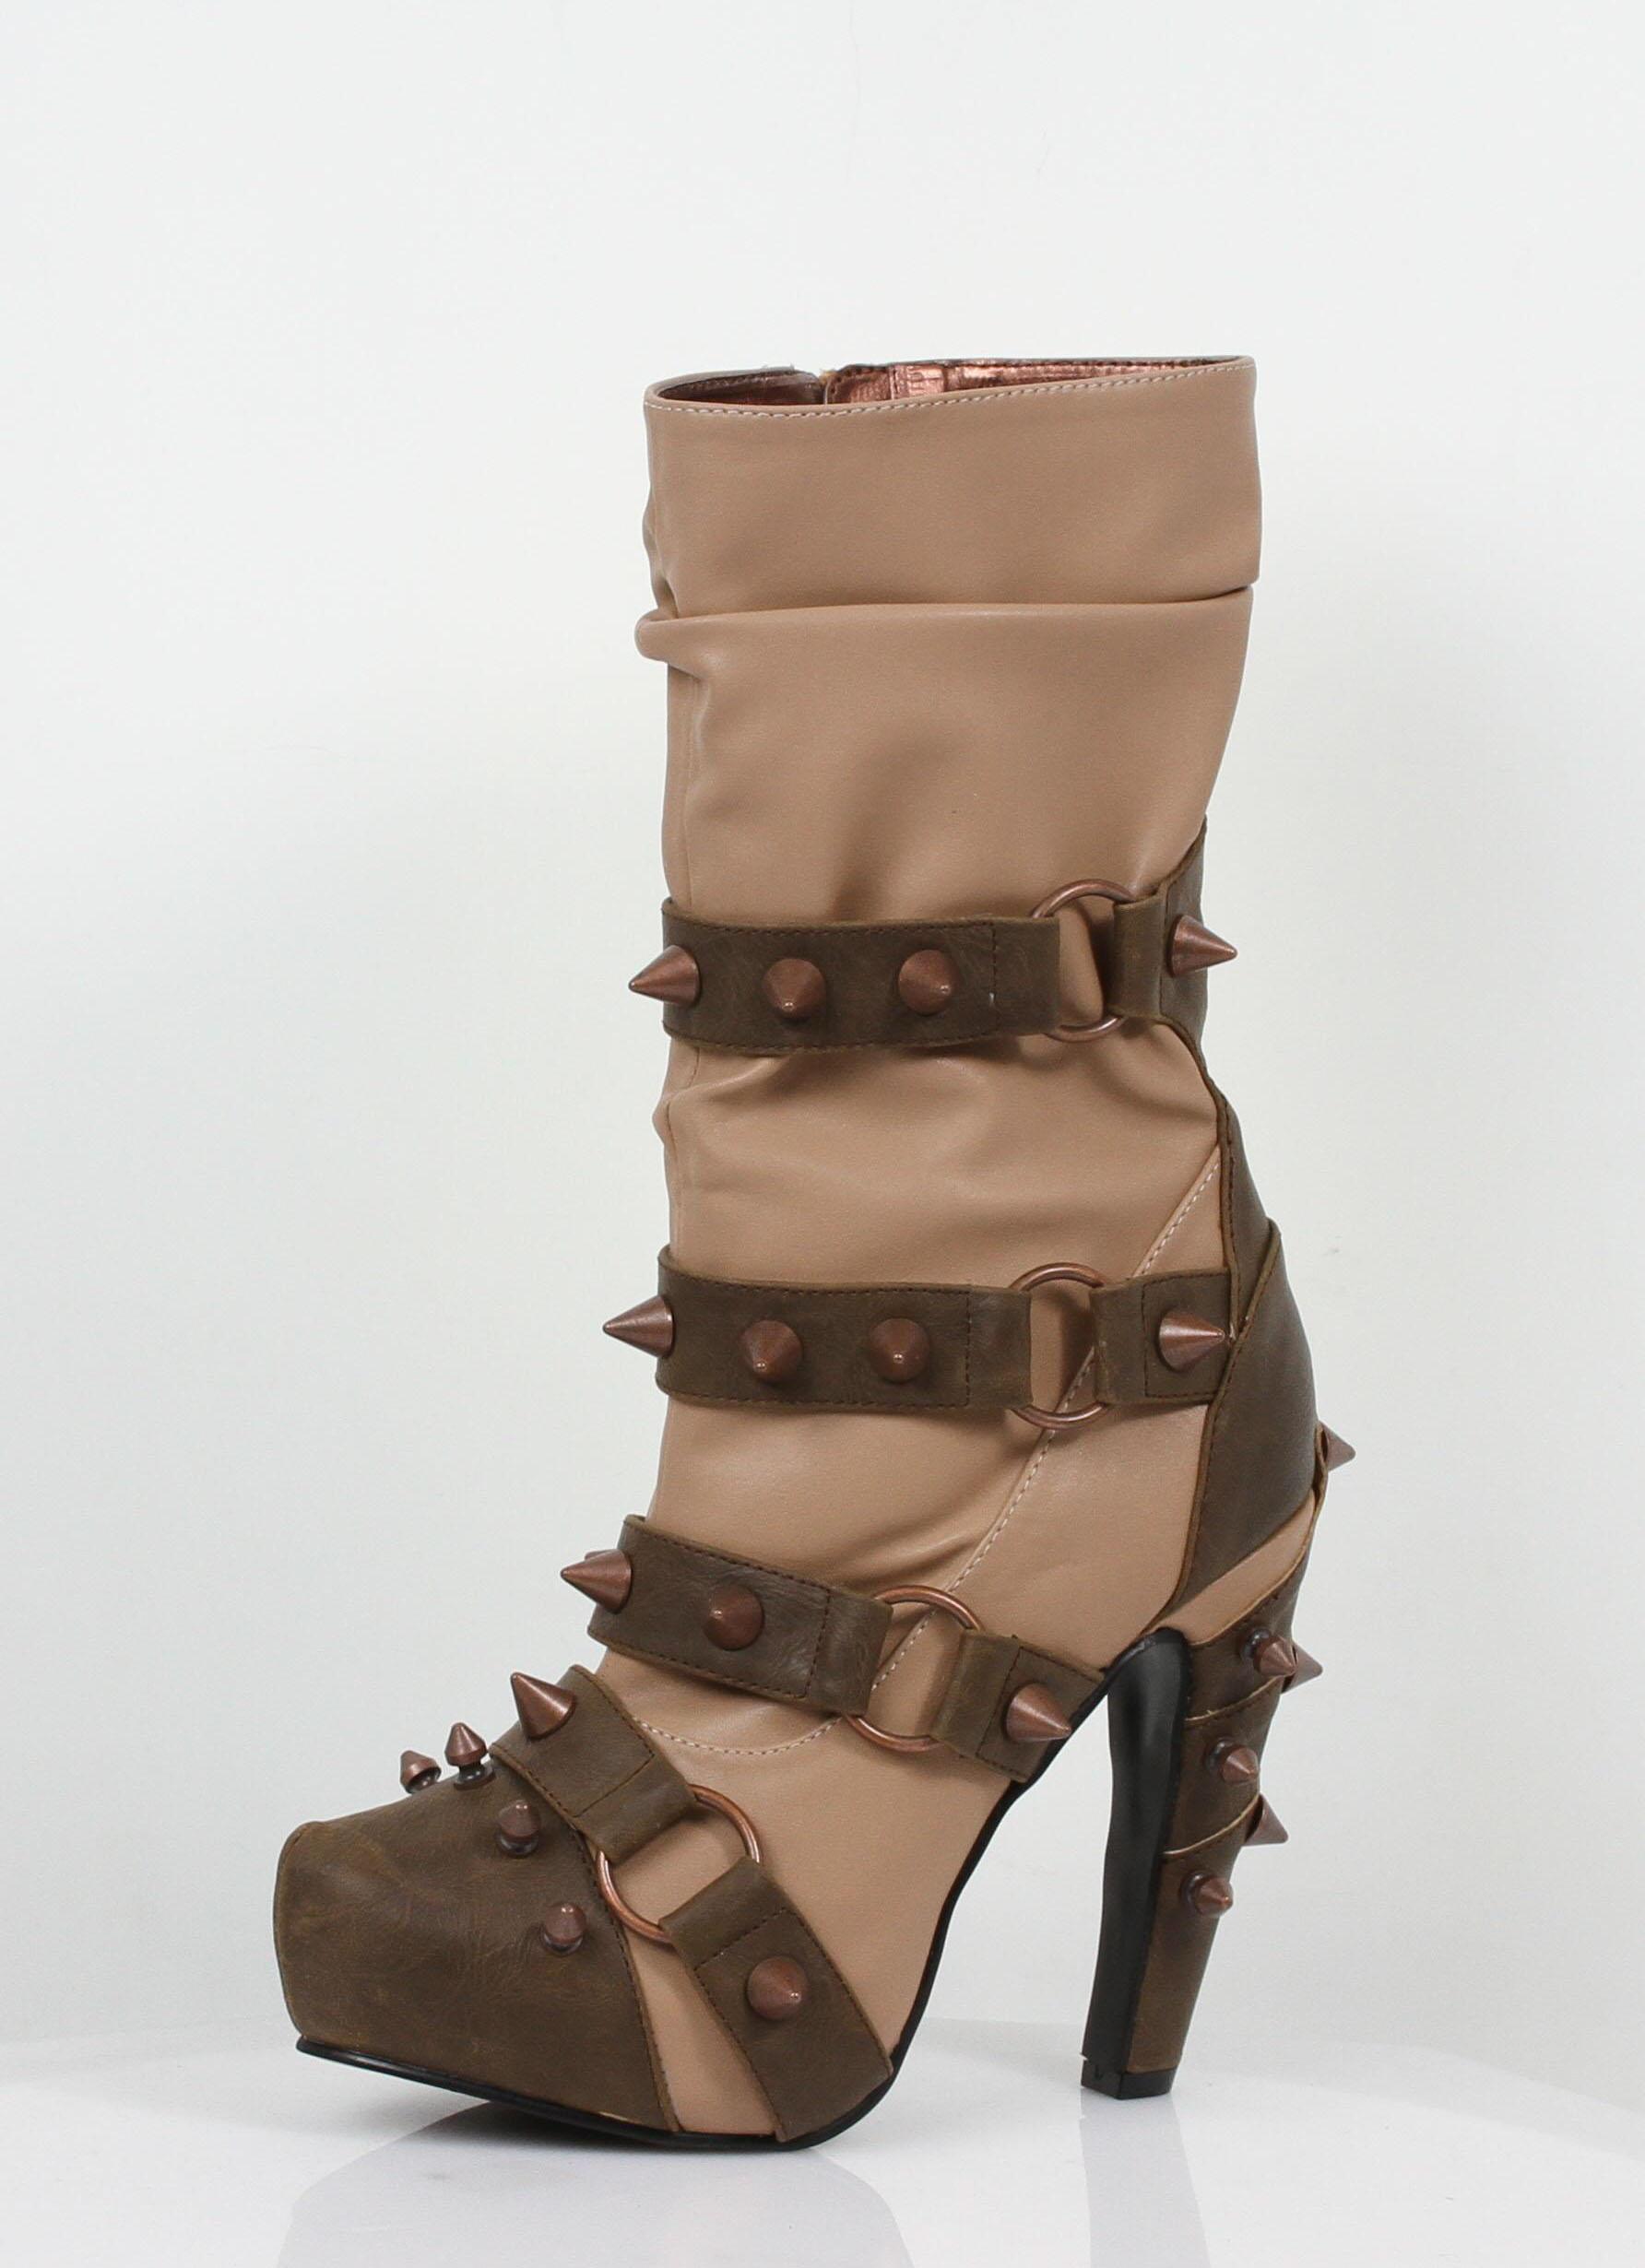 hades_shoes_bjorn_tan_steampunk_booties_boots_3.jpg